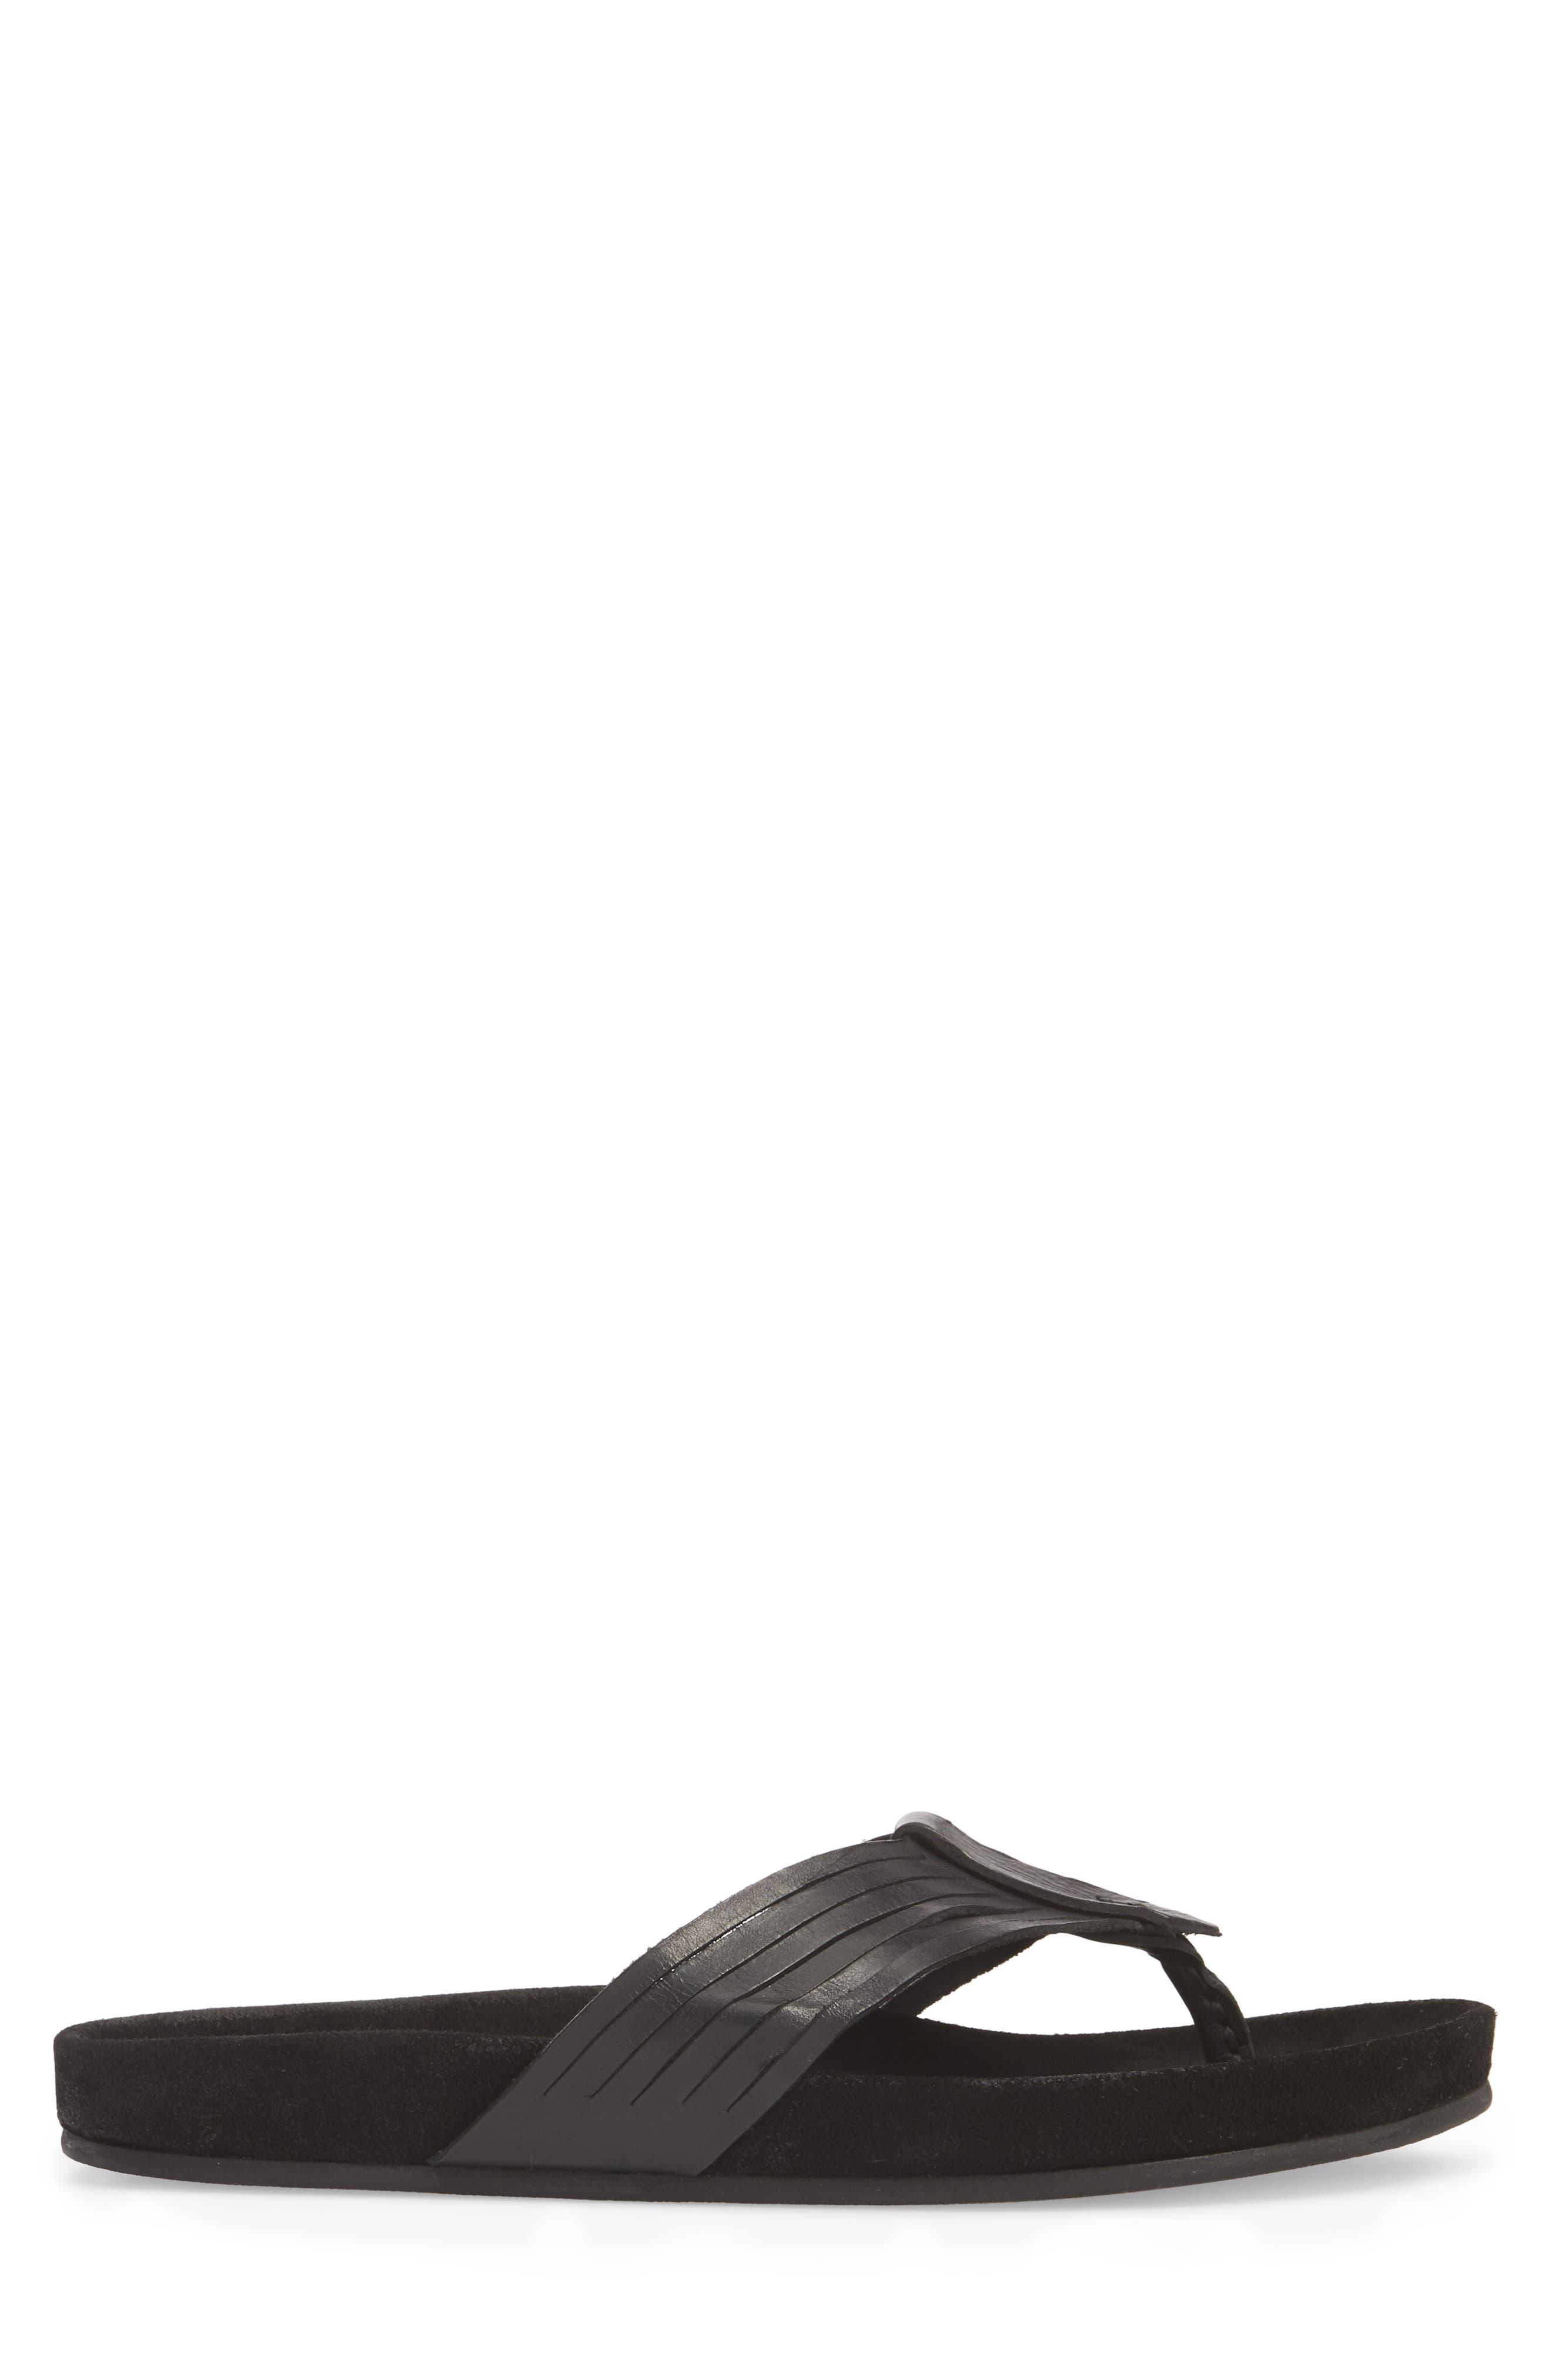 Almada Woven Flip-Flop,                             Alternate thumbnail 3, color,                             001